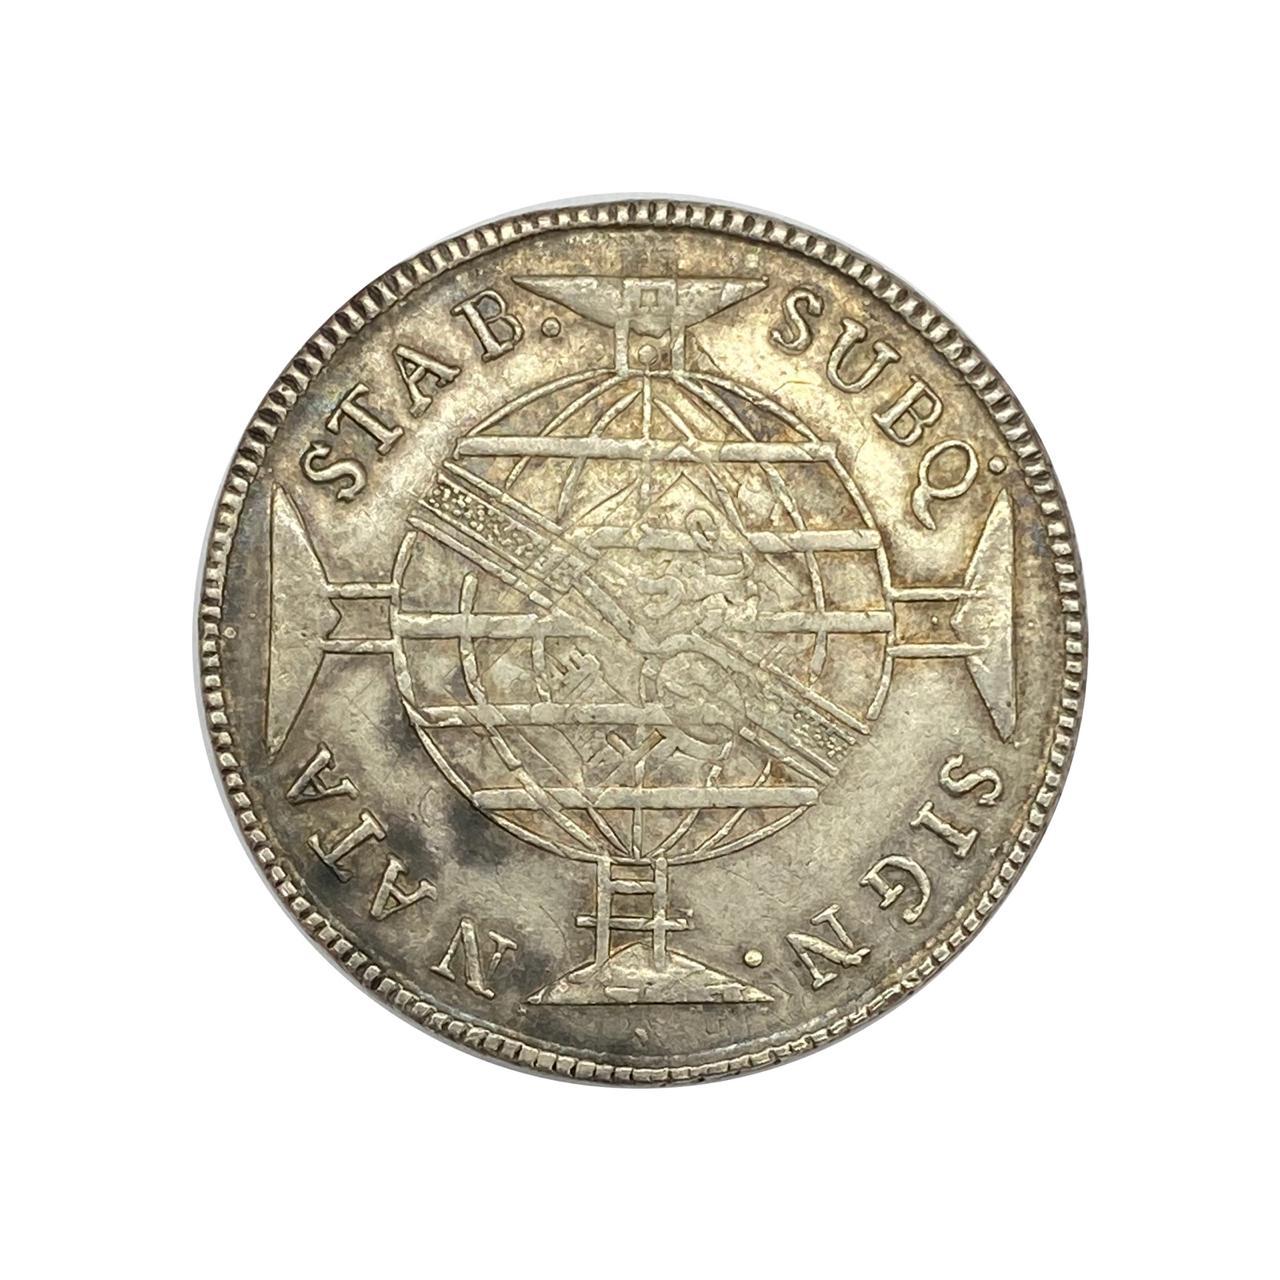 960 Réis 1813 B - PATACÃO